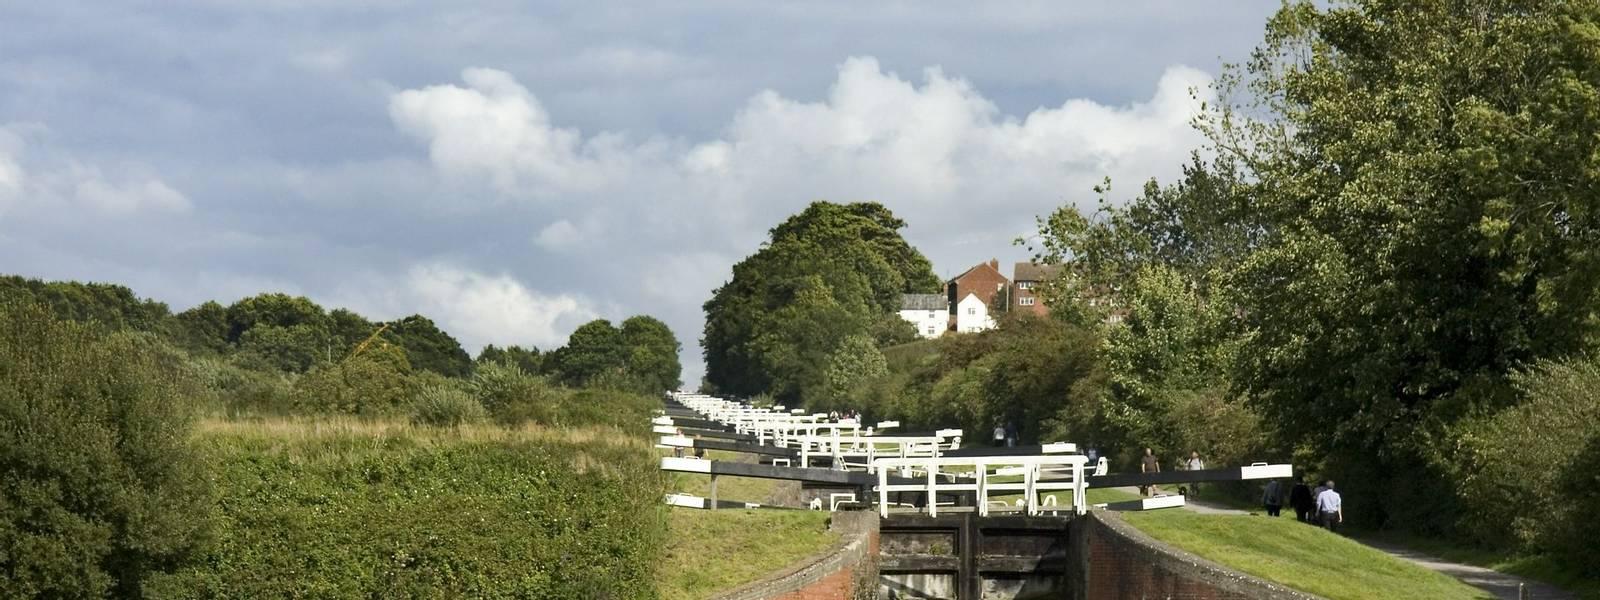 Caen Hill Locks Kennet and Avon Canal AdobeStock_111265165.jpeg